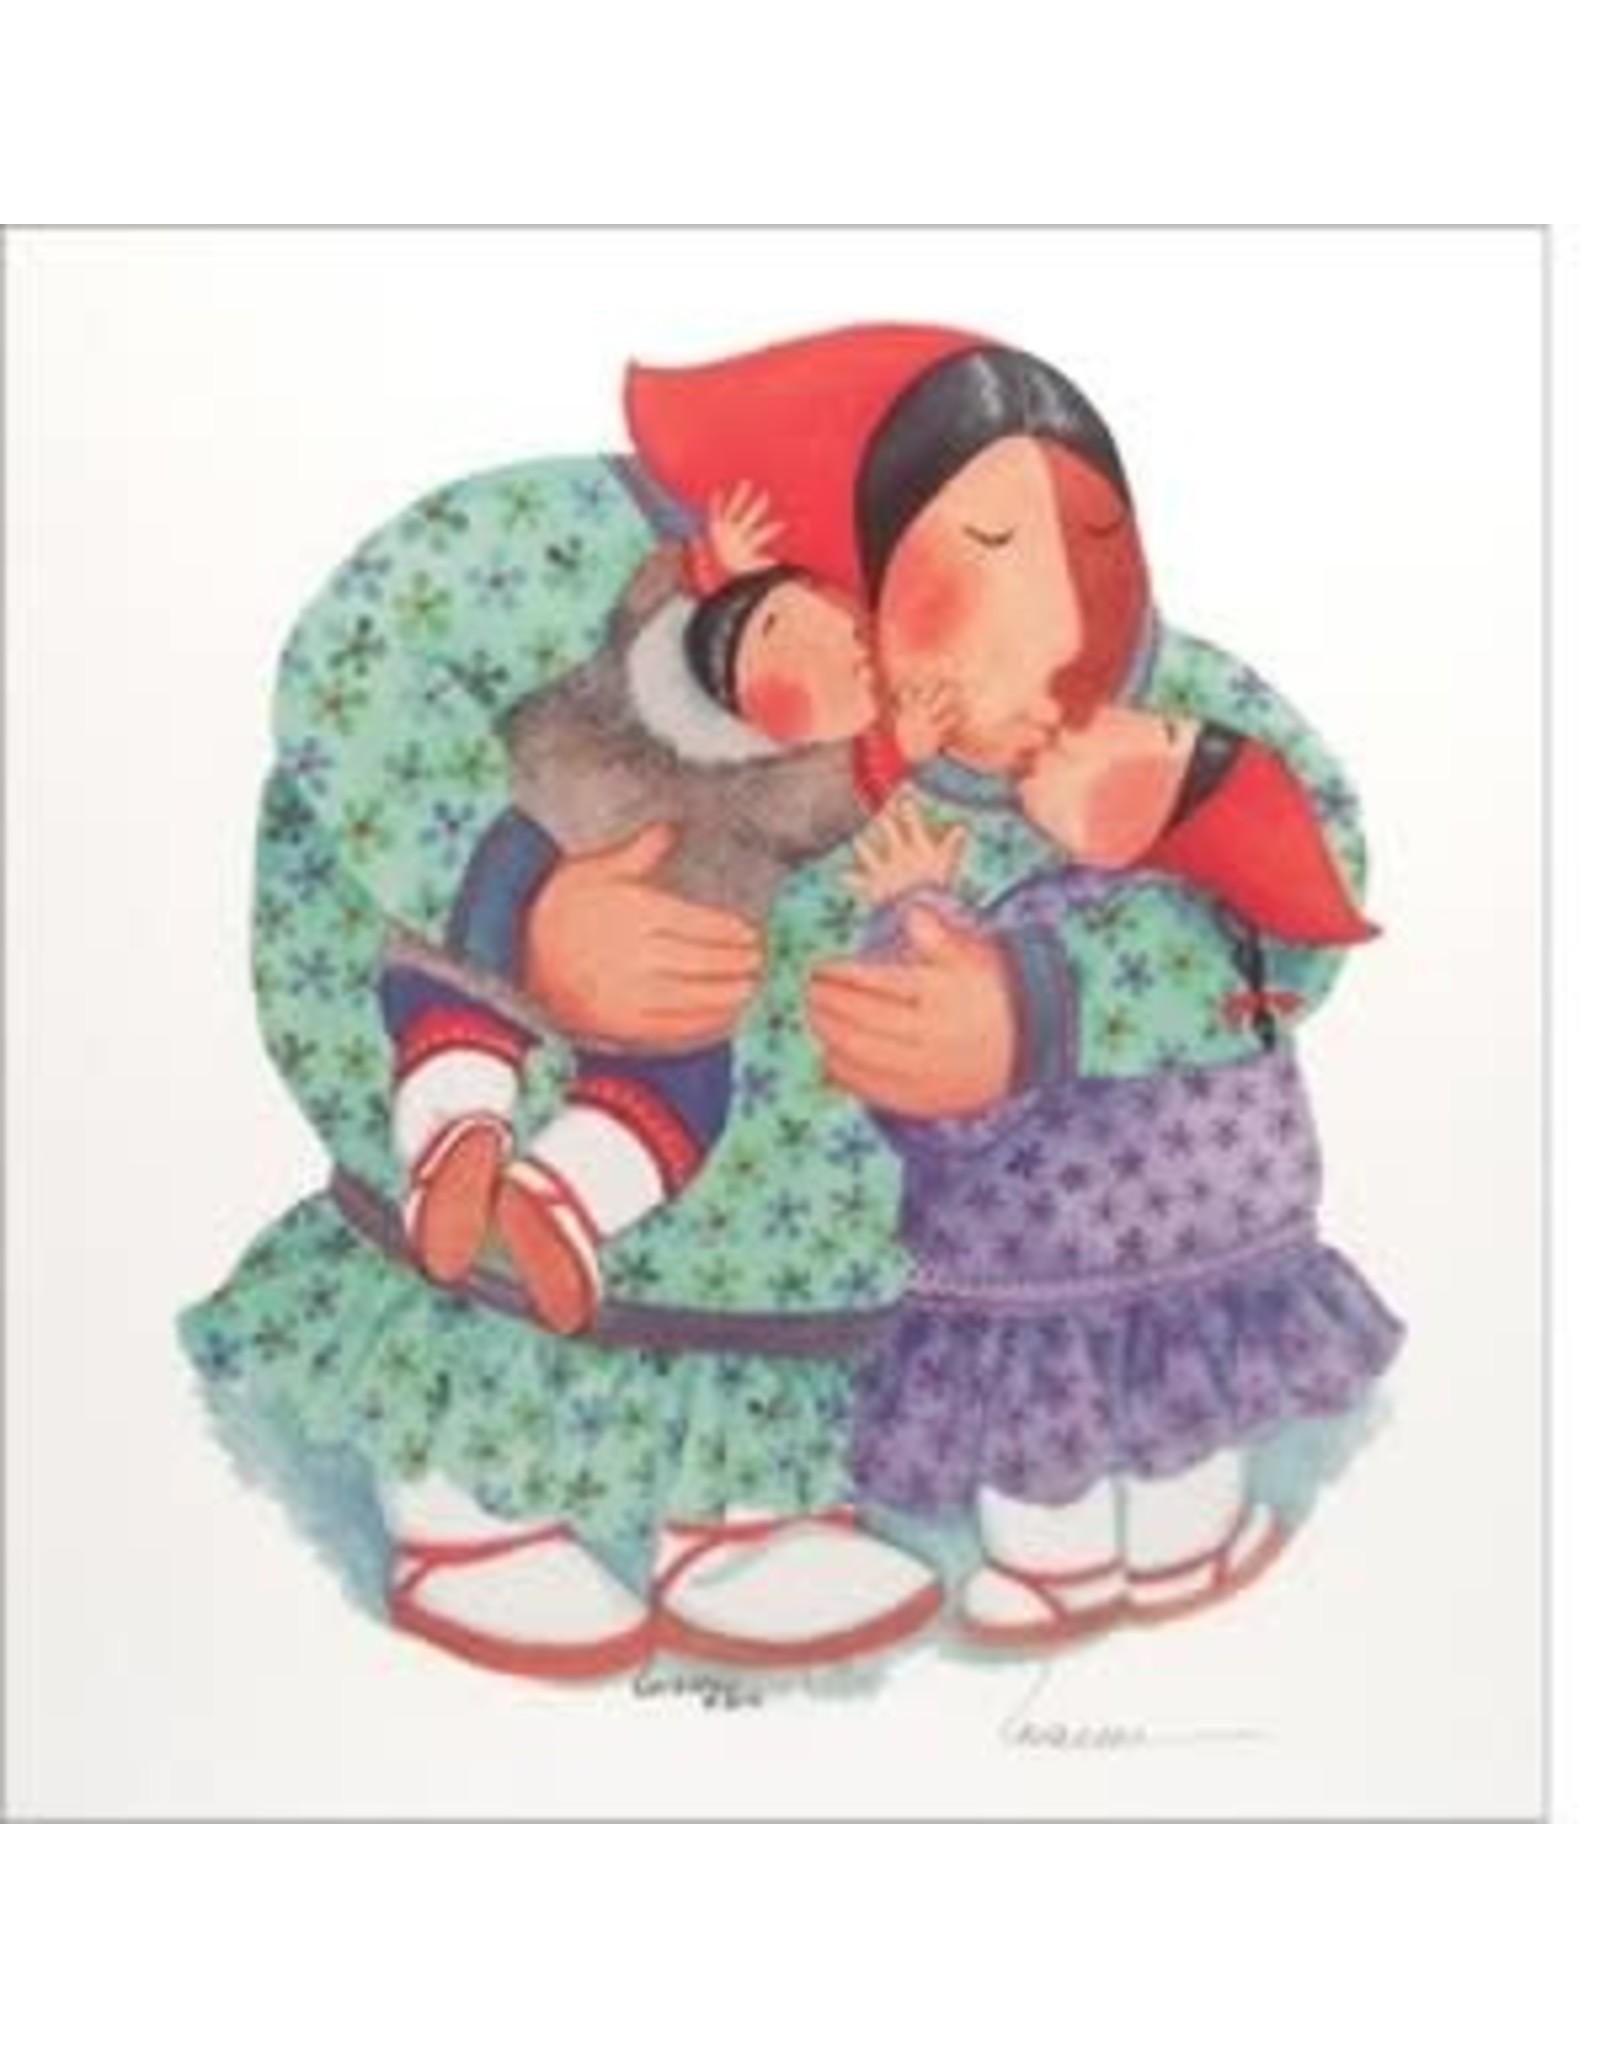 Barbara Lavallee Sharing Hugs | Barbara Lavallee